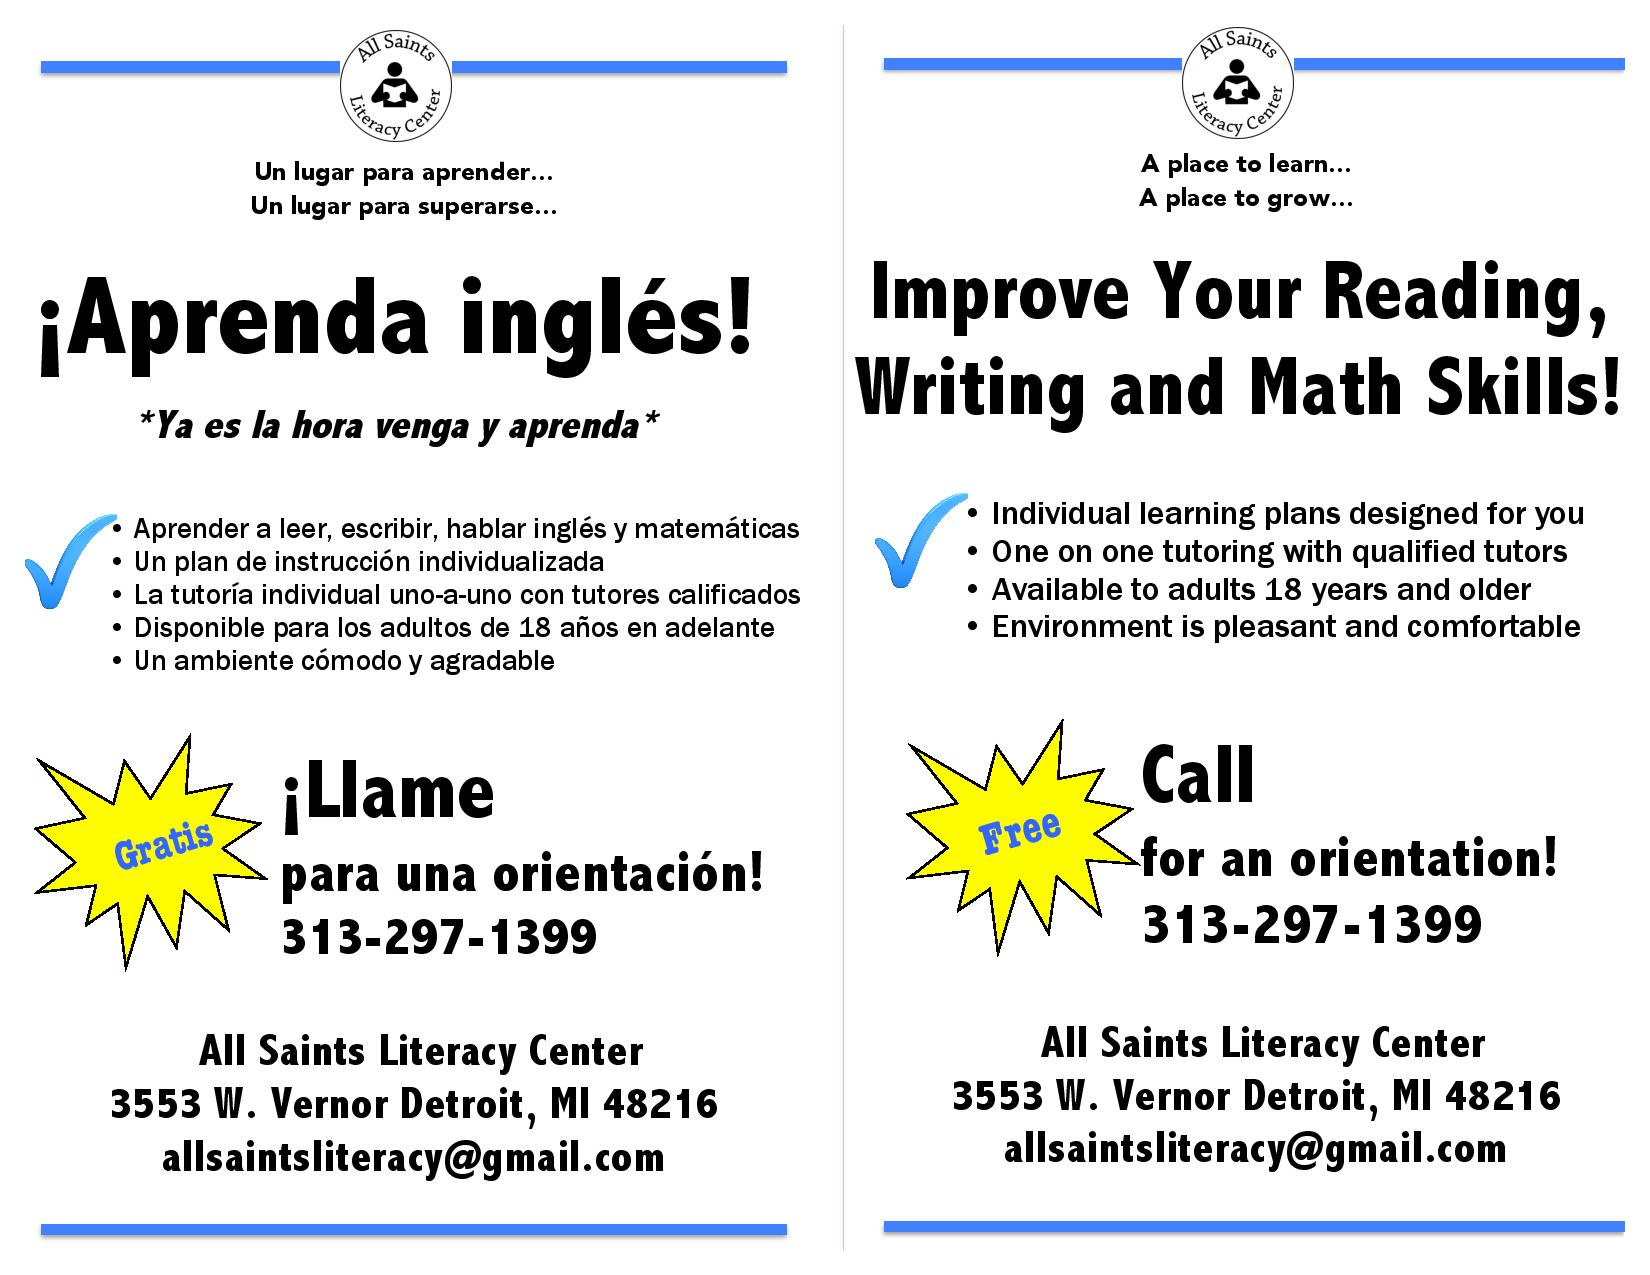 ASLC Flyer bilingual.jpg